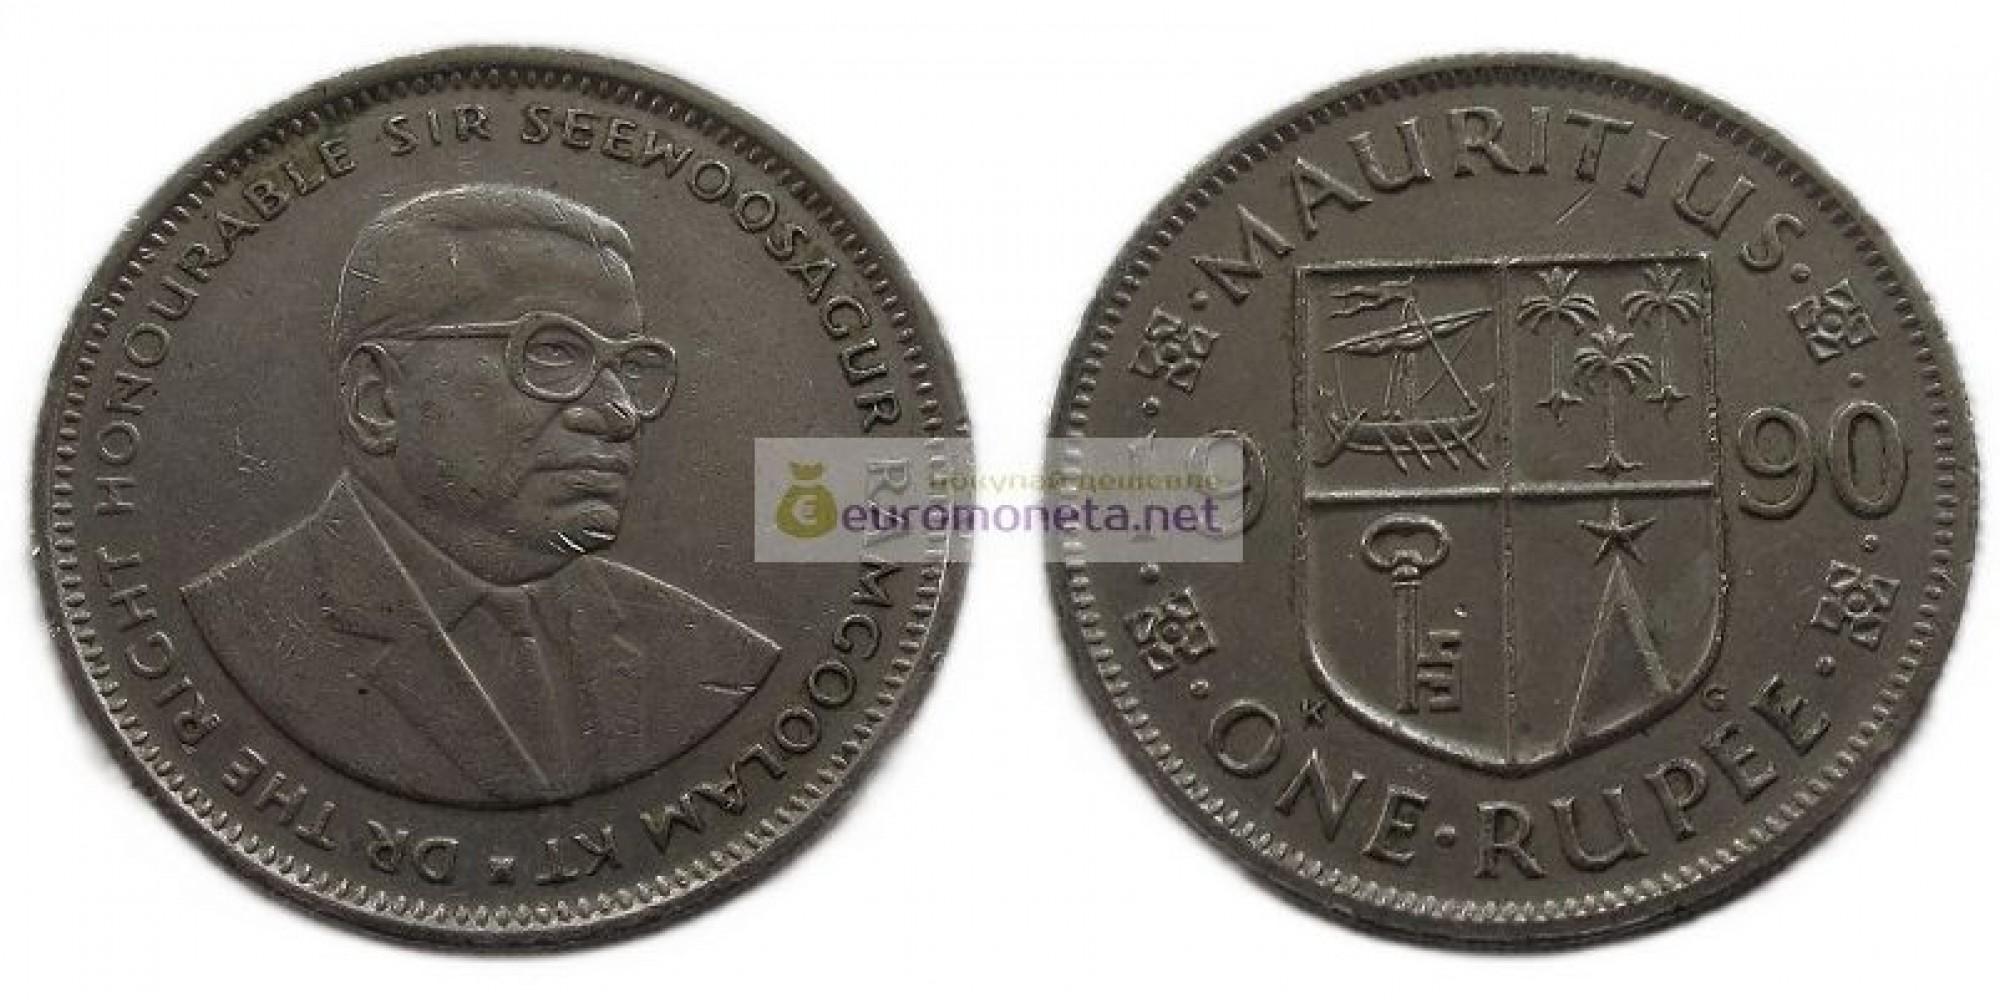 Маврикий 1 рупия 1990 год. Сивусагур Рамгулам